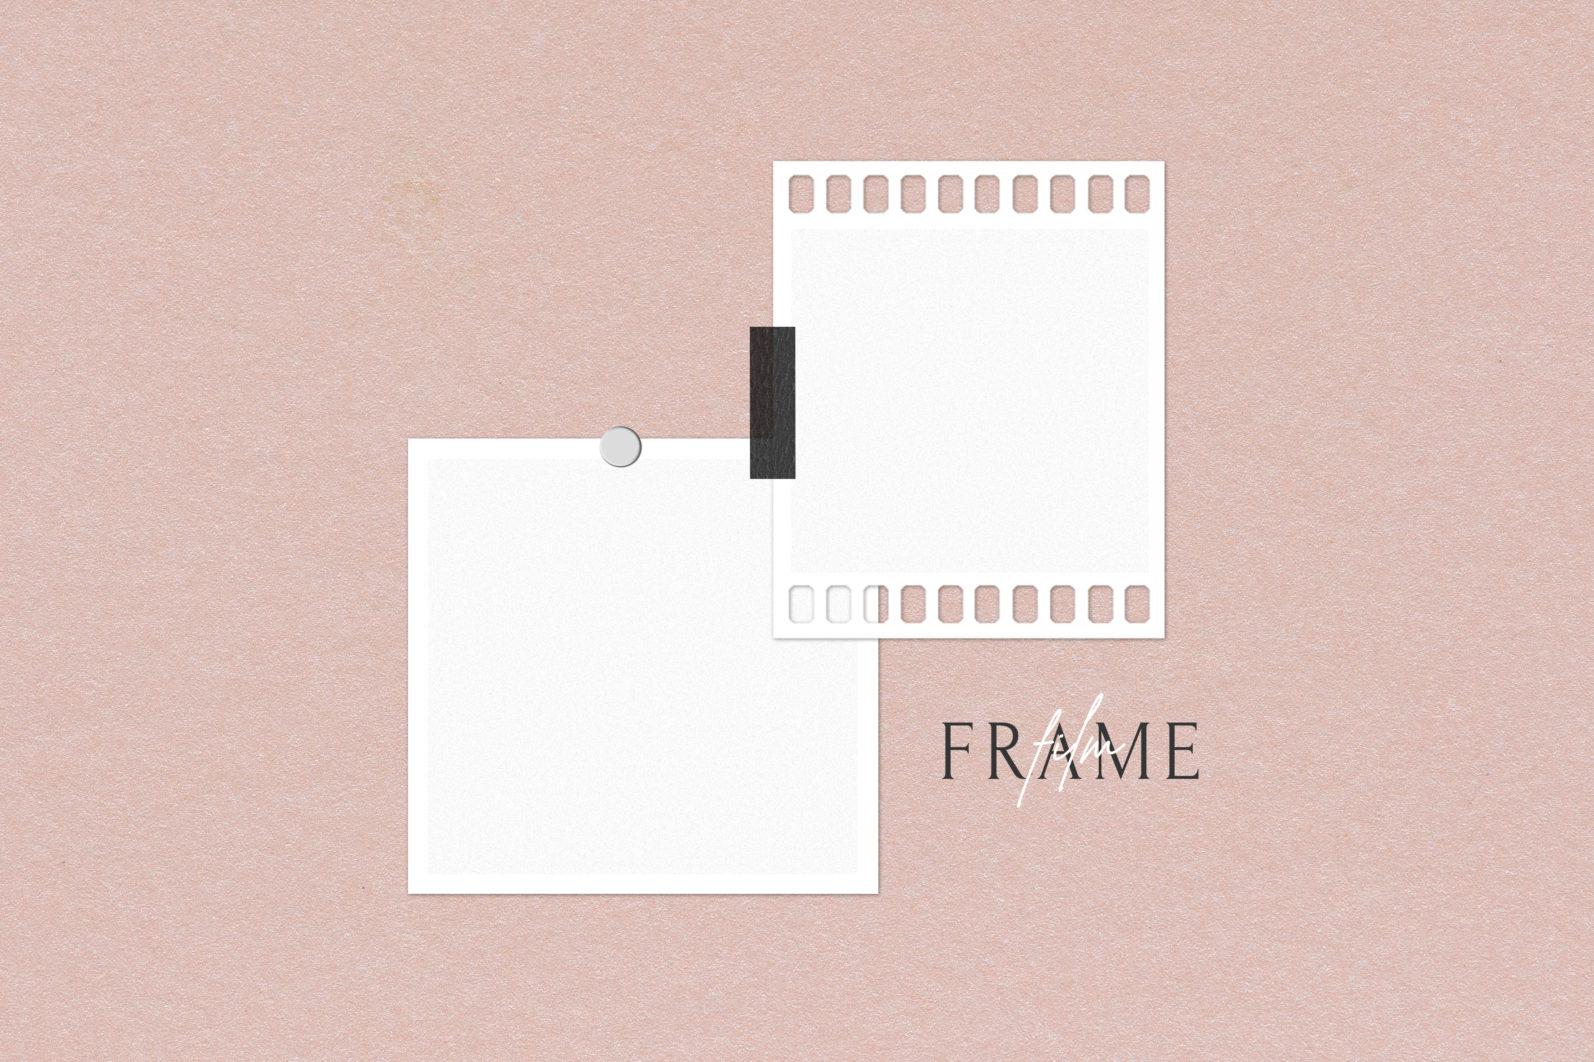 Frame Mockup #1416, White Portrait Photo Frame Mockup, Film Frame Mockup - 1416 Preview 2 scaled -